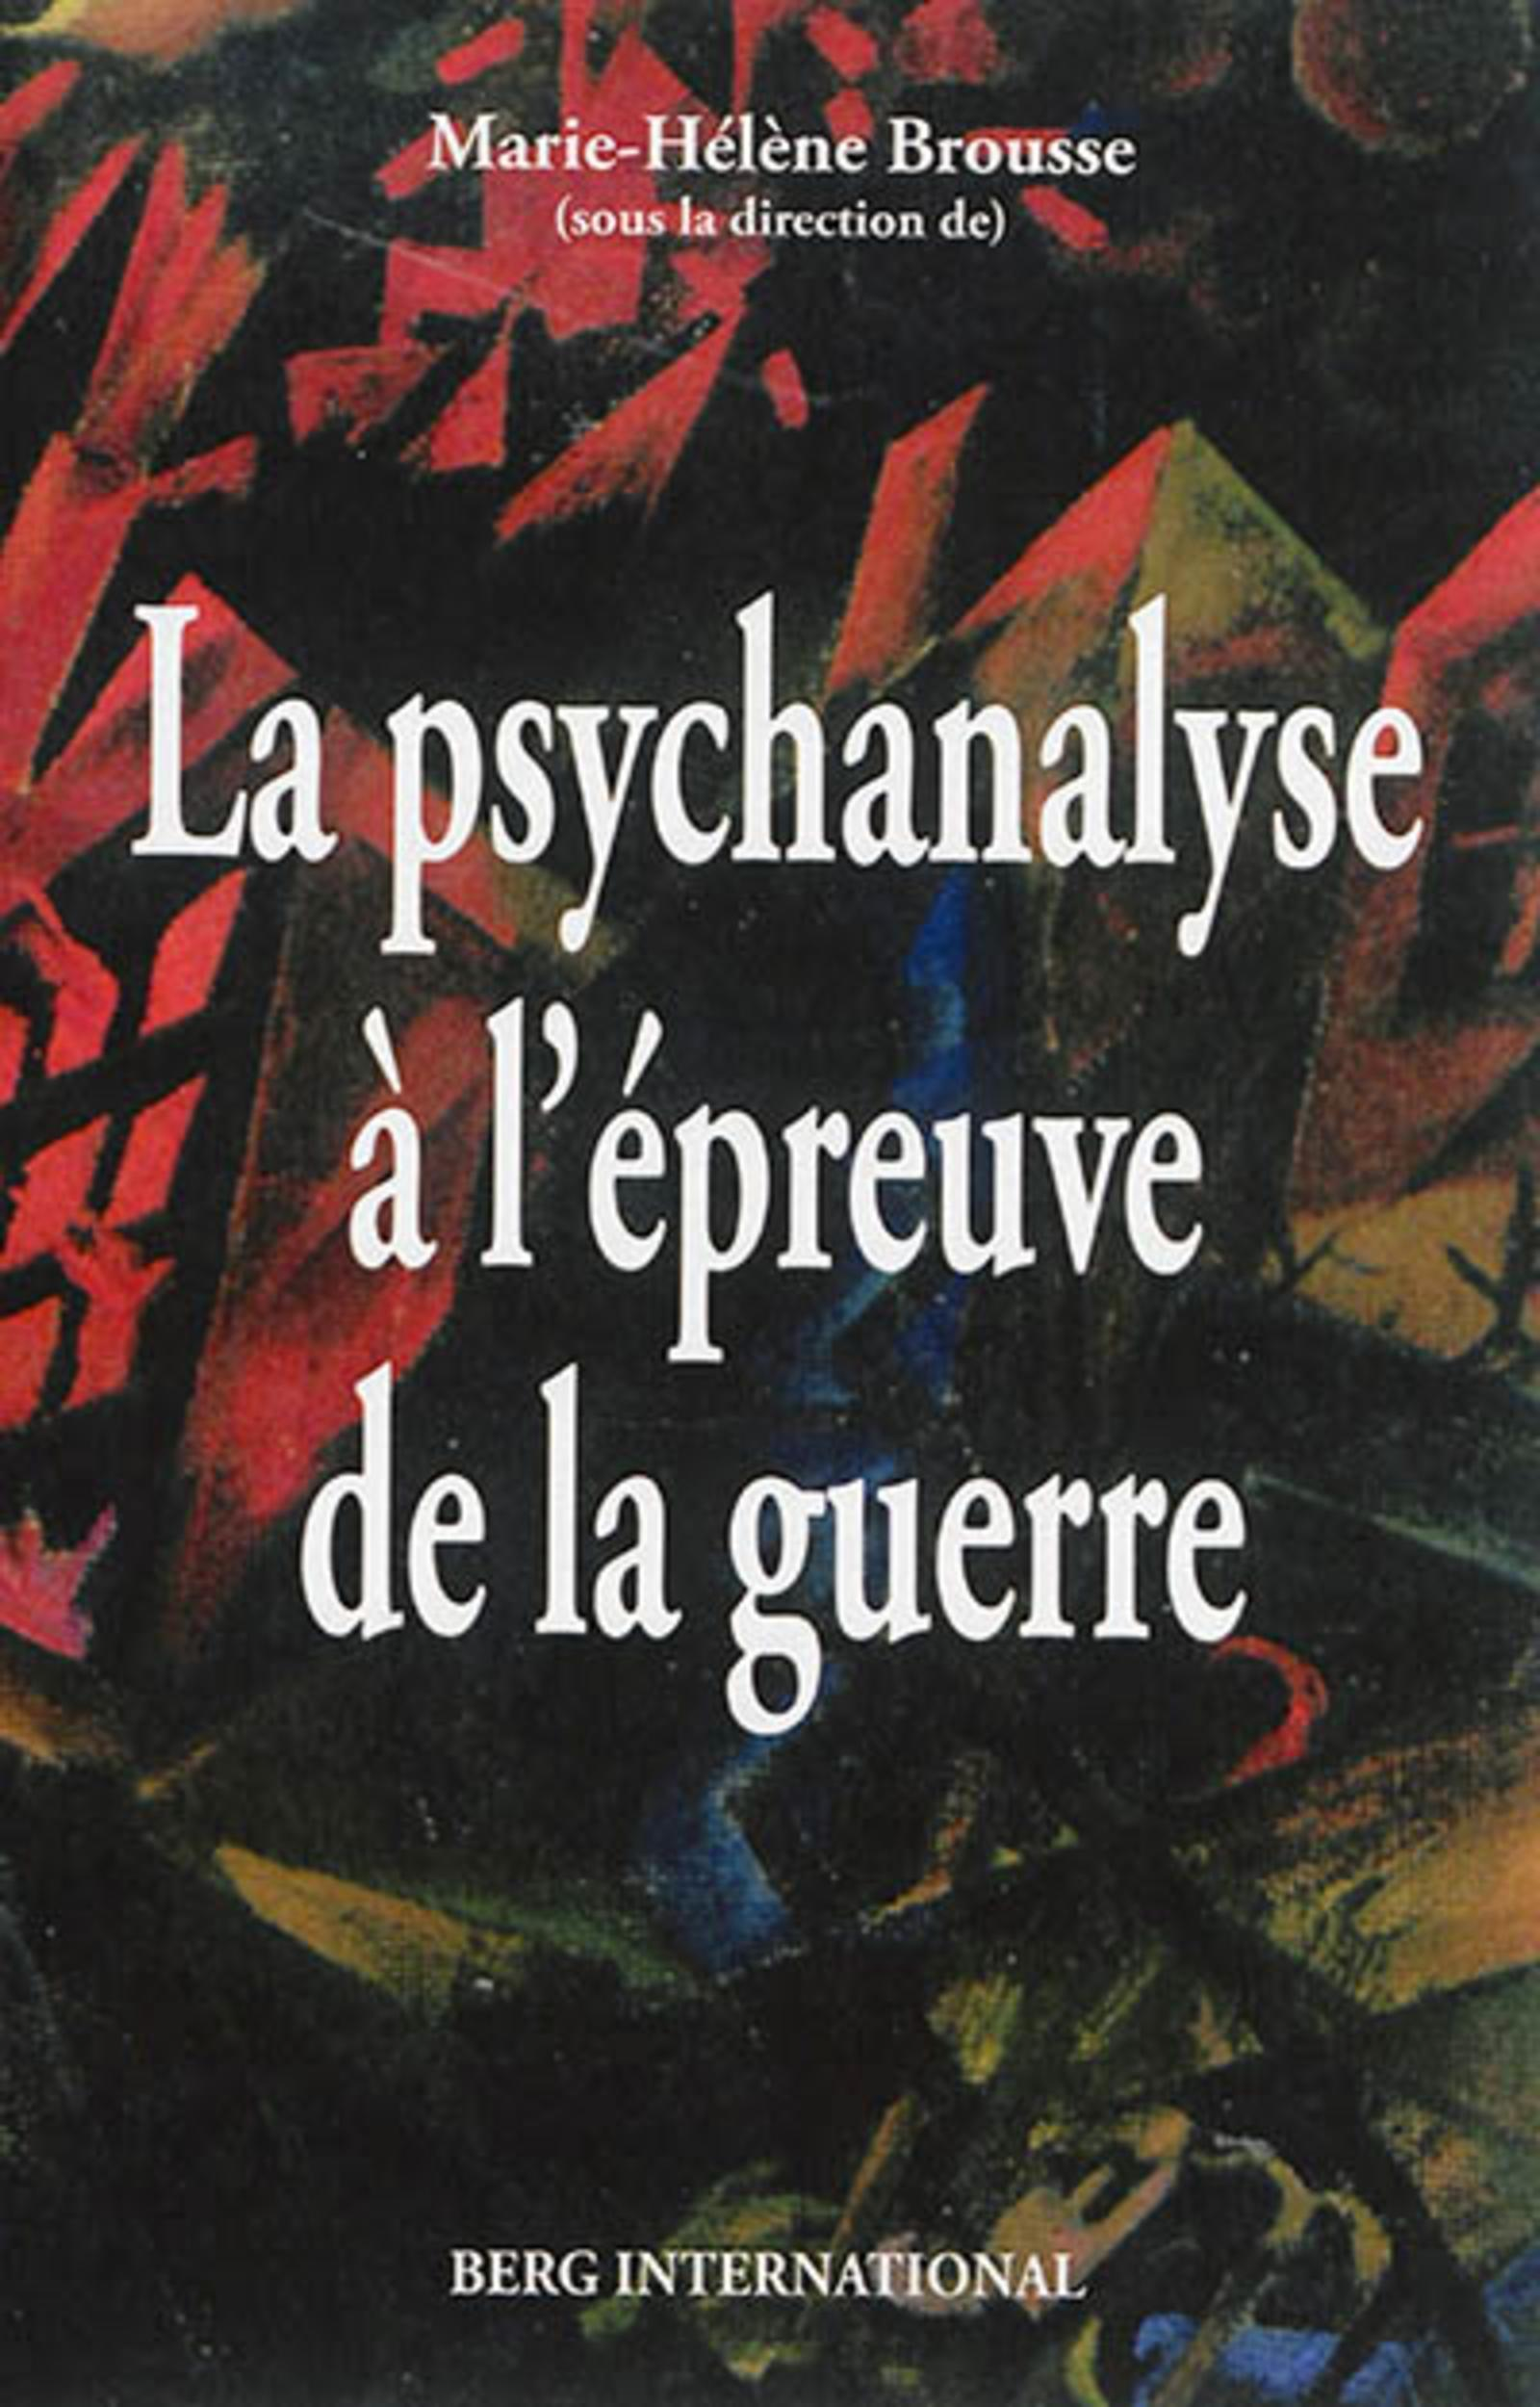 LA PSYCHANALYSE A L'EPREUVE DE LA GUERRE